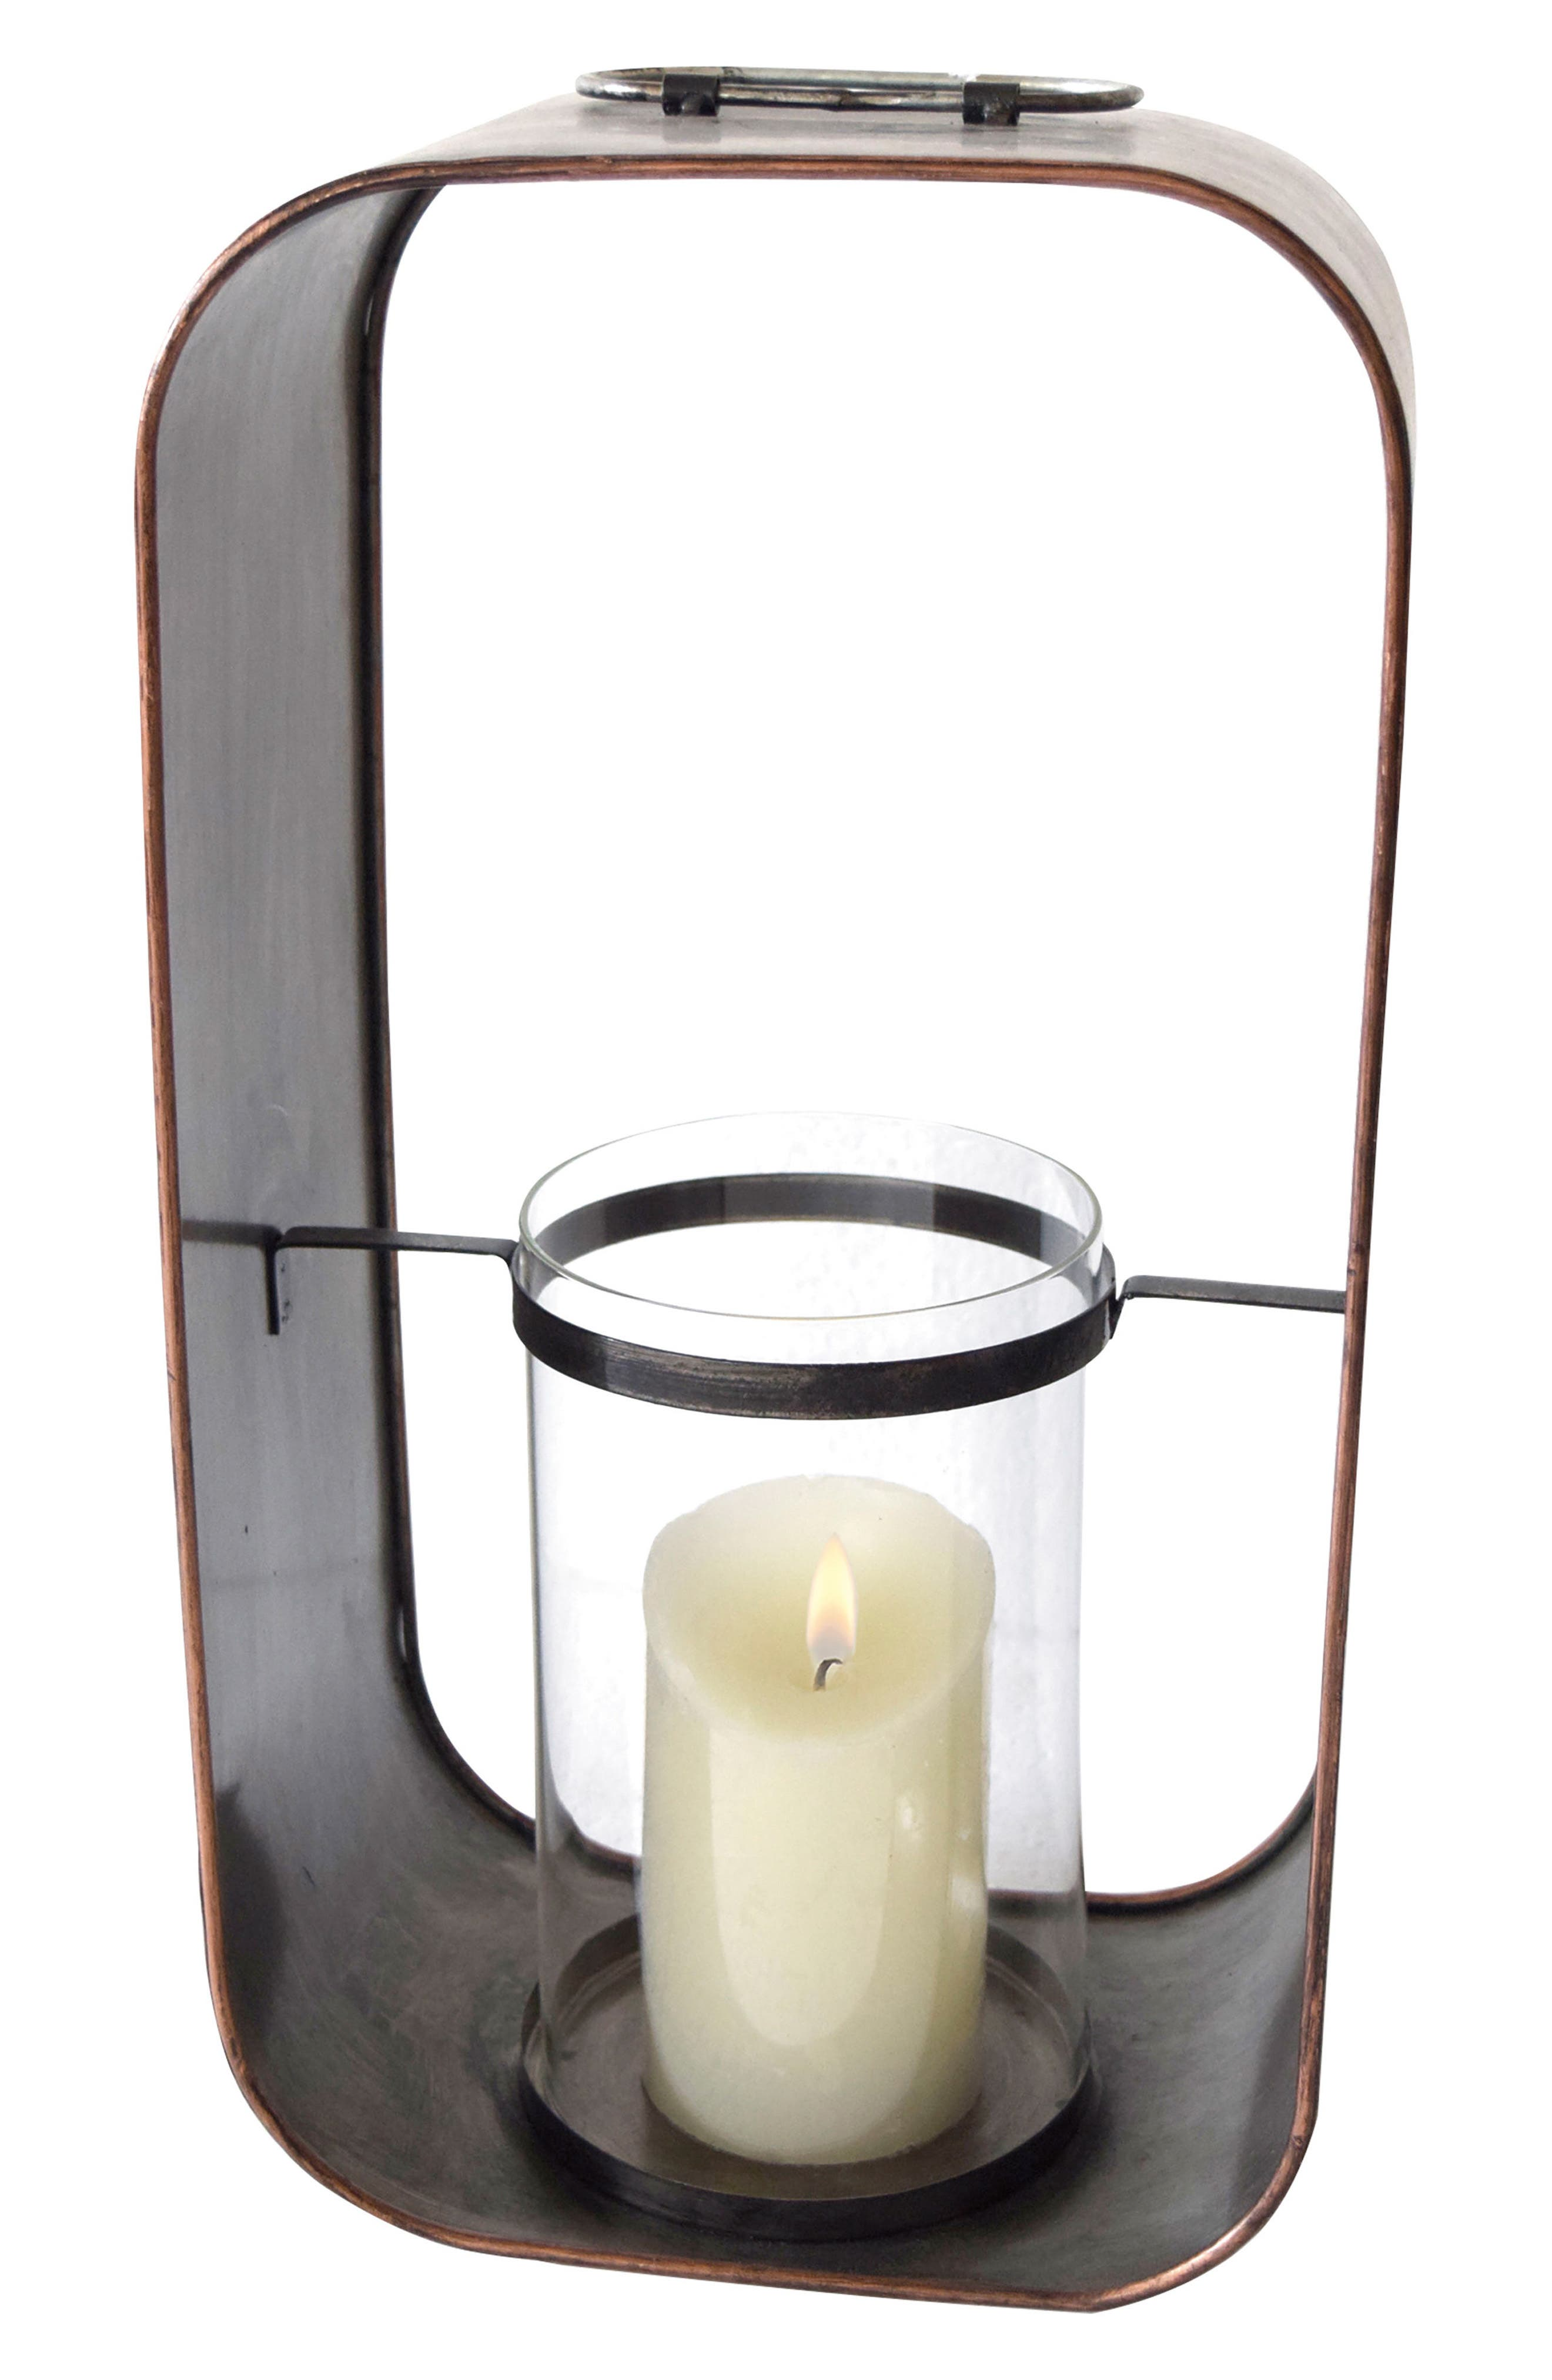 Alternate Image 1 Selected - Foreside Barn Votive Candle Holder